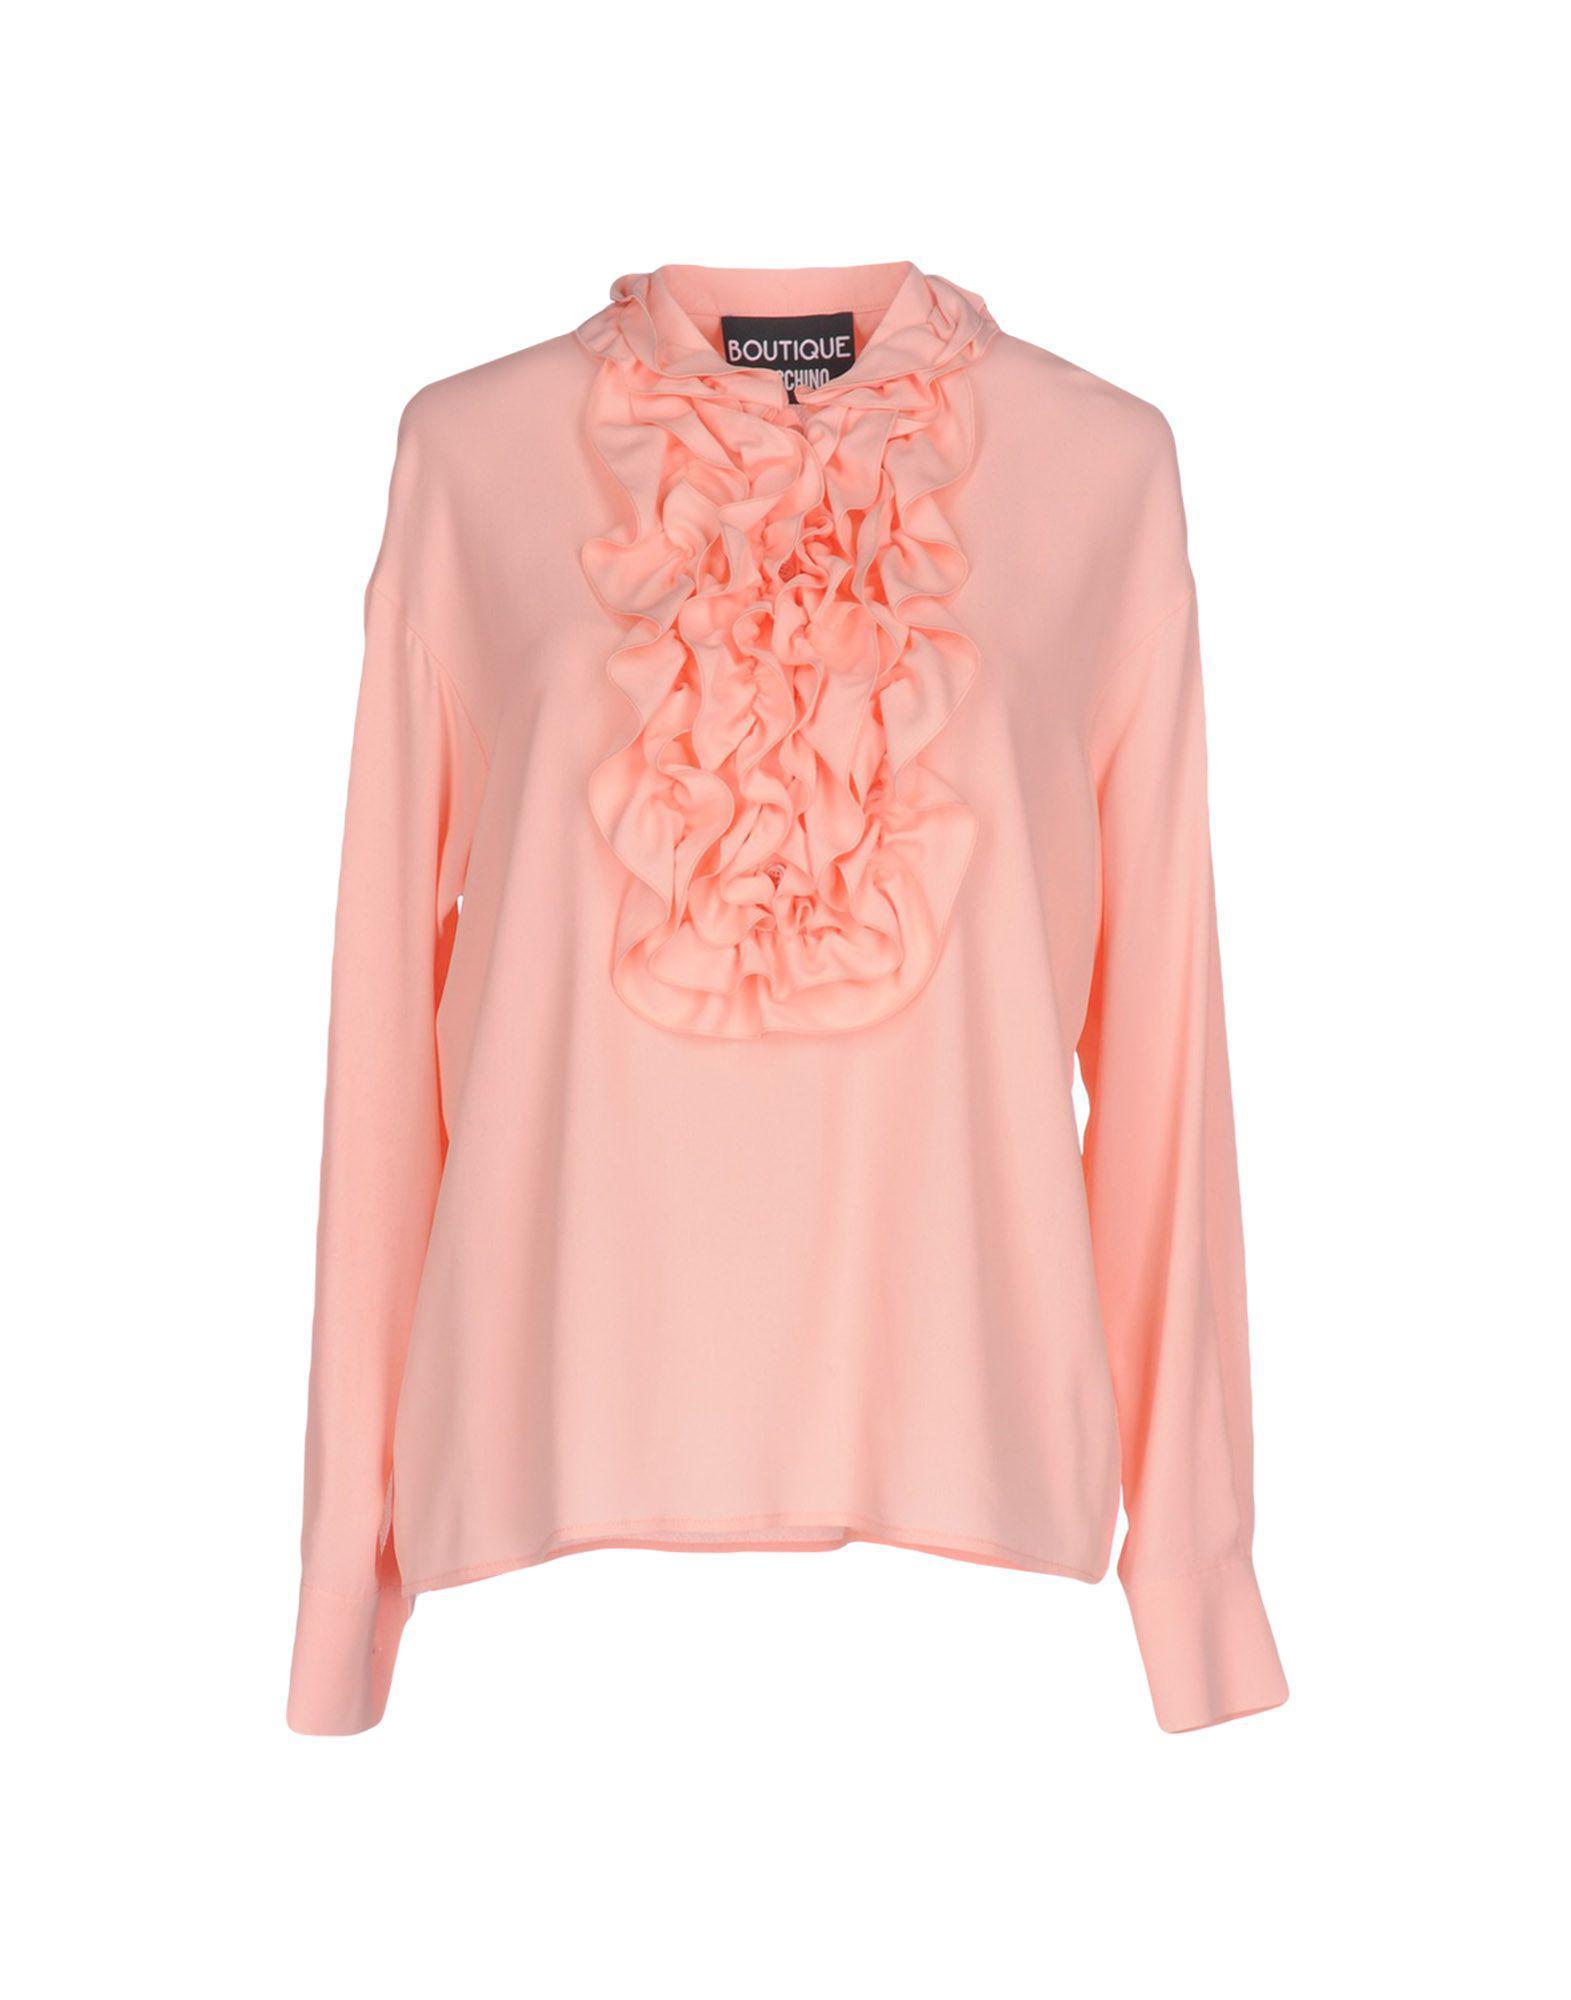 b4d4fcf22428c Boutique Moschino - Pink Blouse - Lyst. View fullscreen